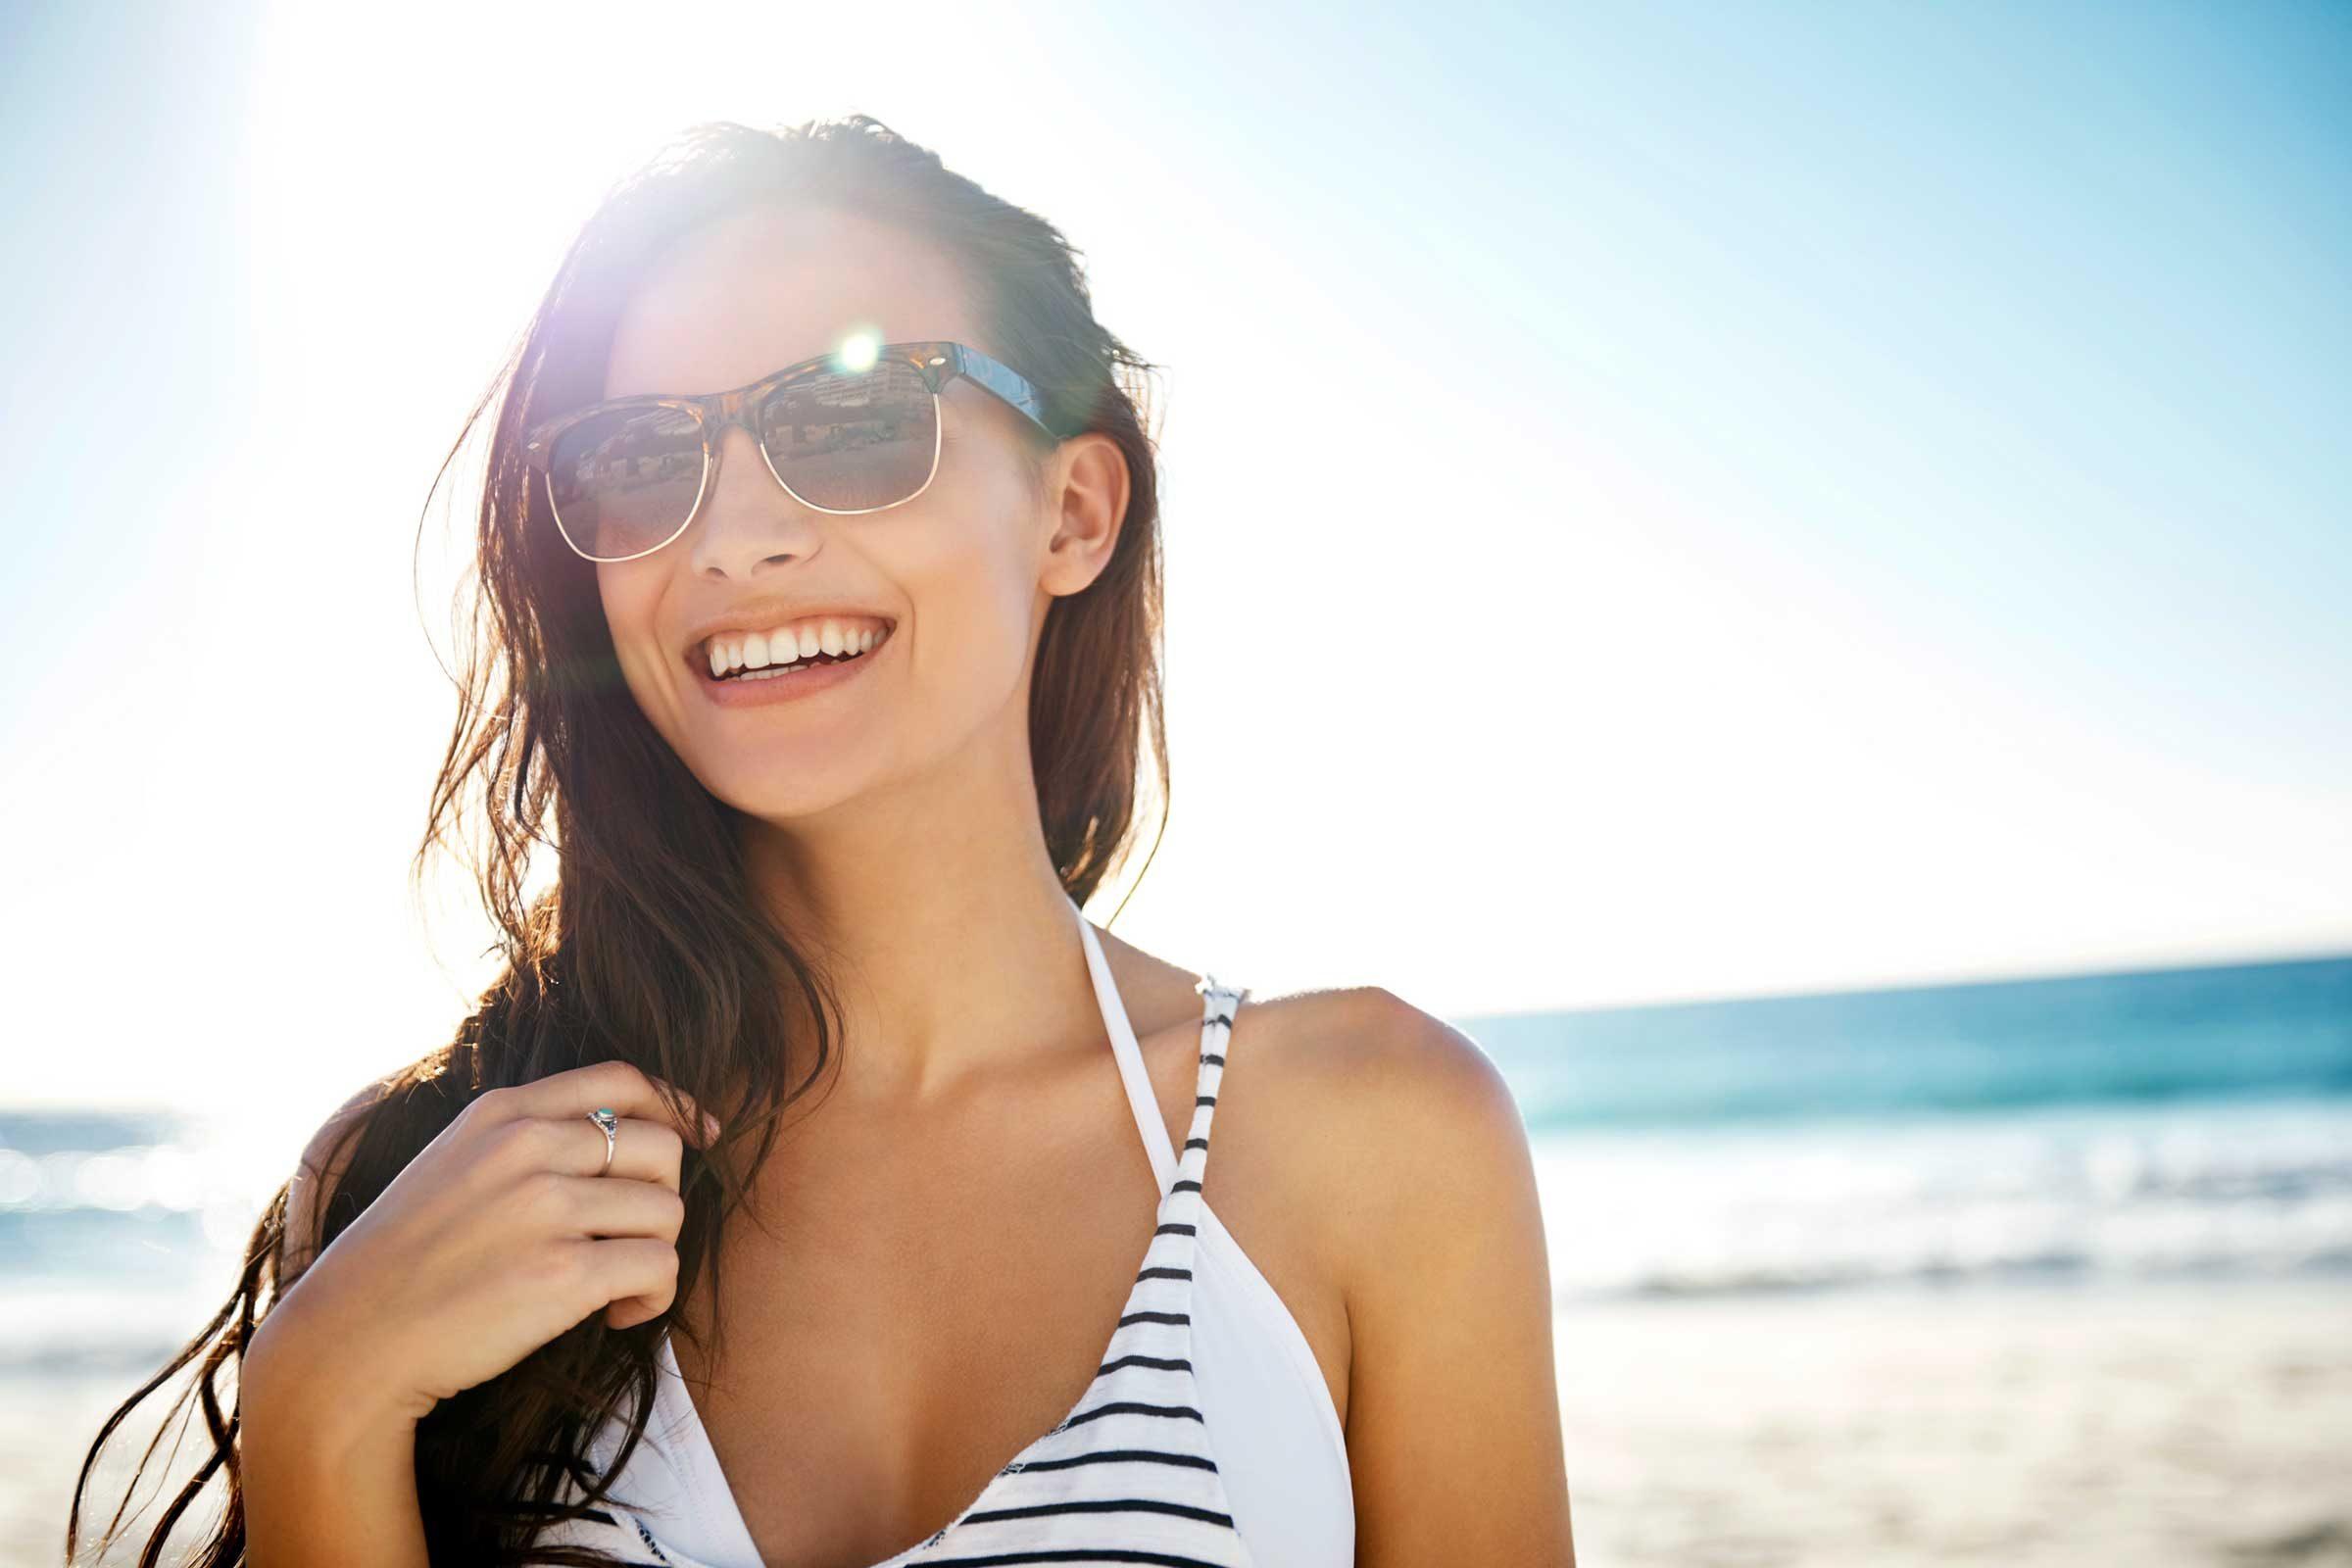 woman wearing sunglasses at beach